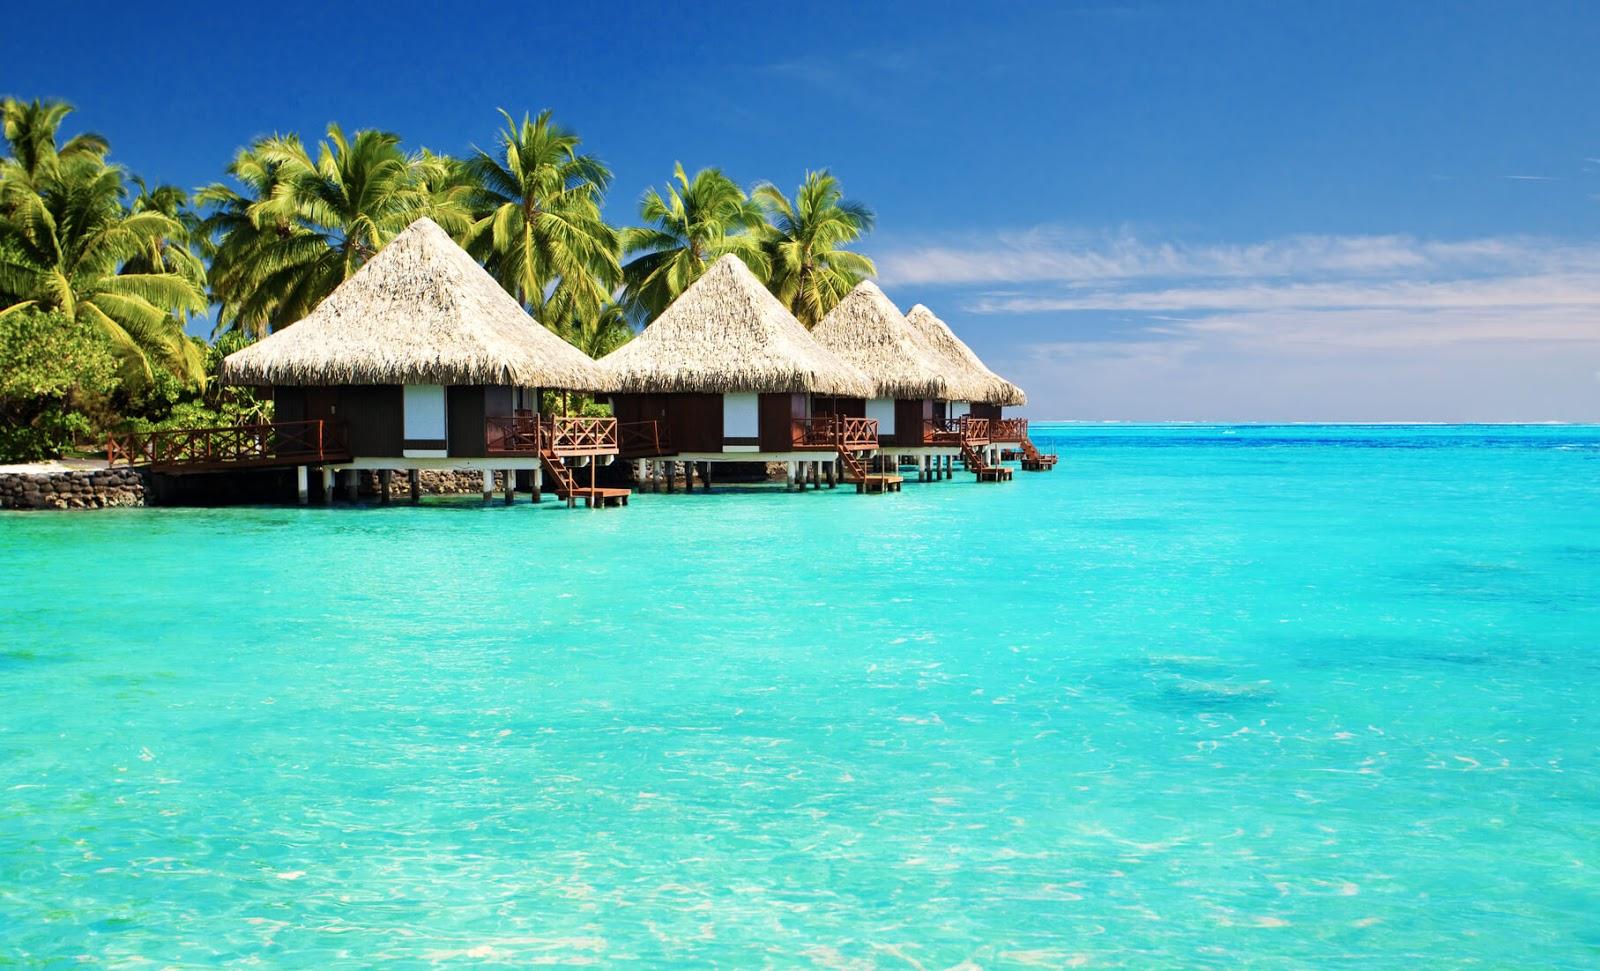 3 Tempat Wisata Paling Romantis Untuk Bulan Madu, Pasangan Baru Menikah Wajib Tahu Nih!